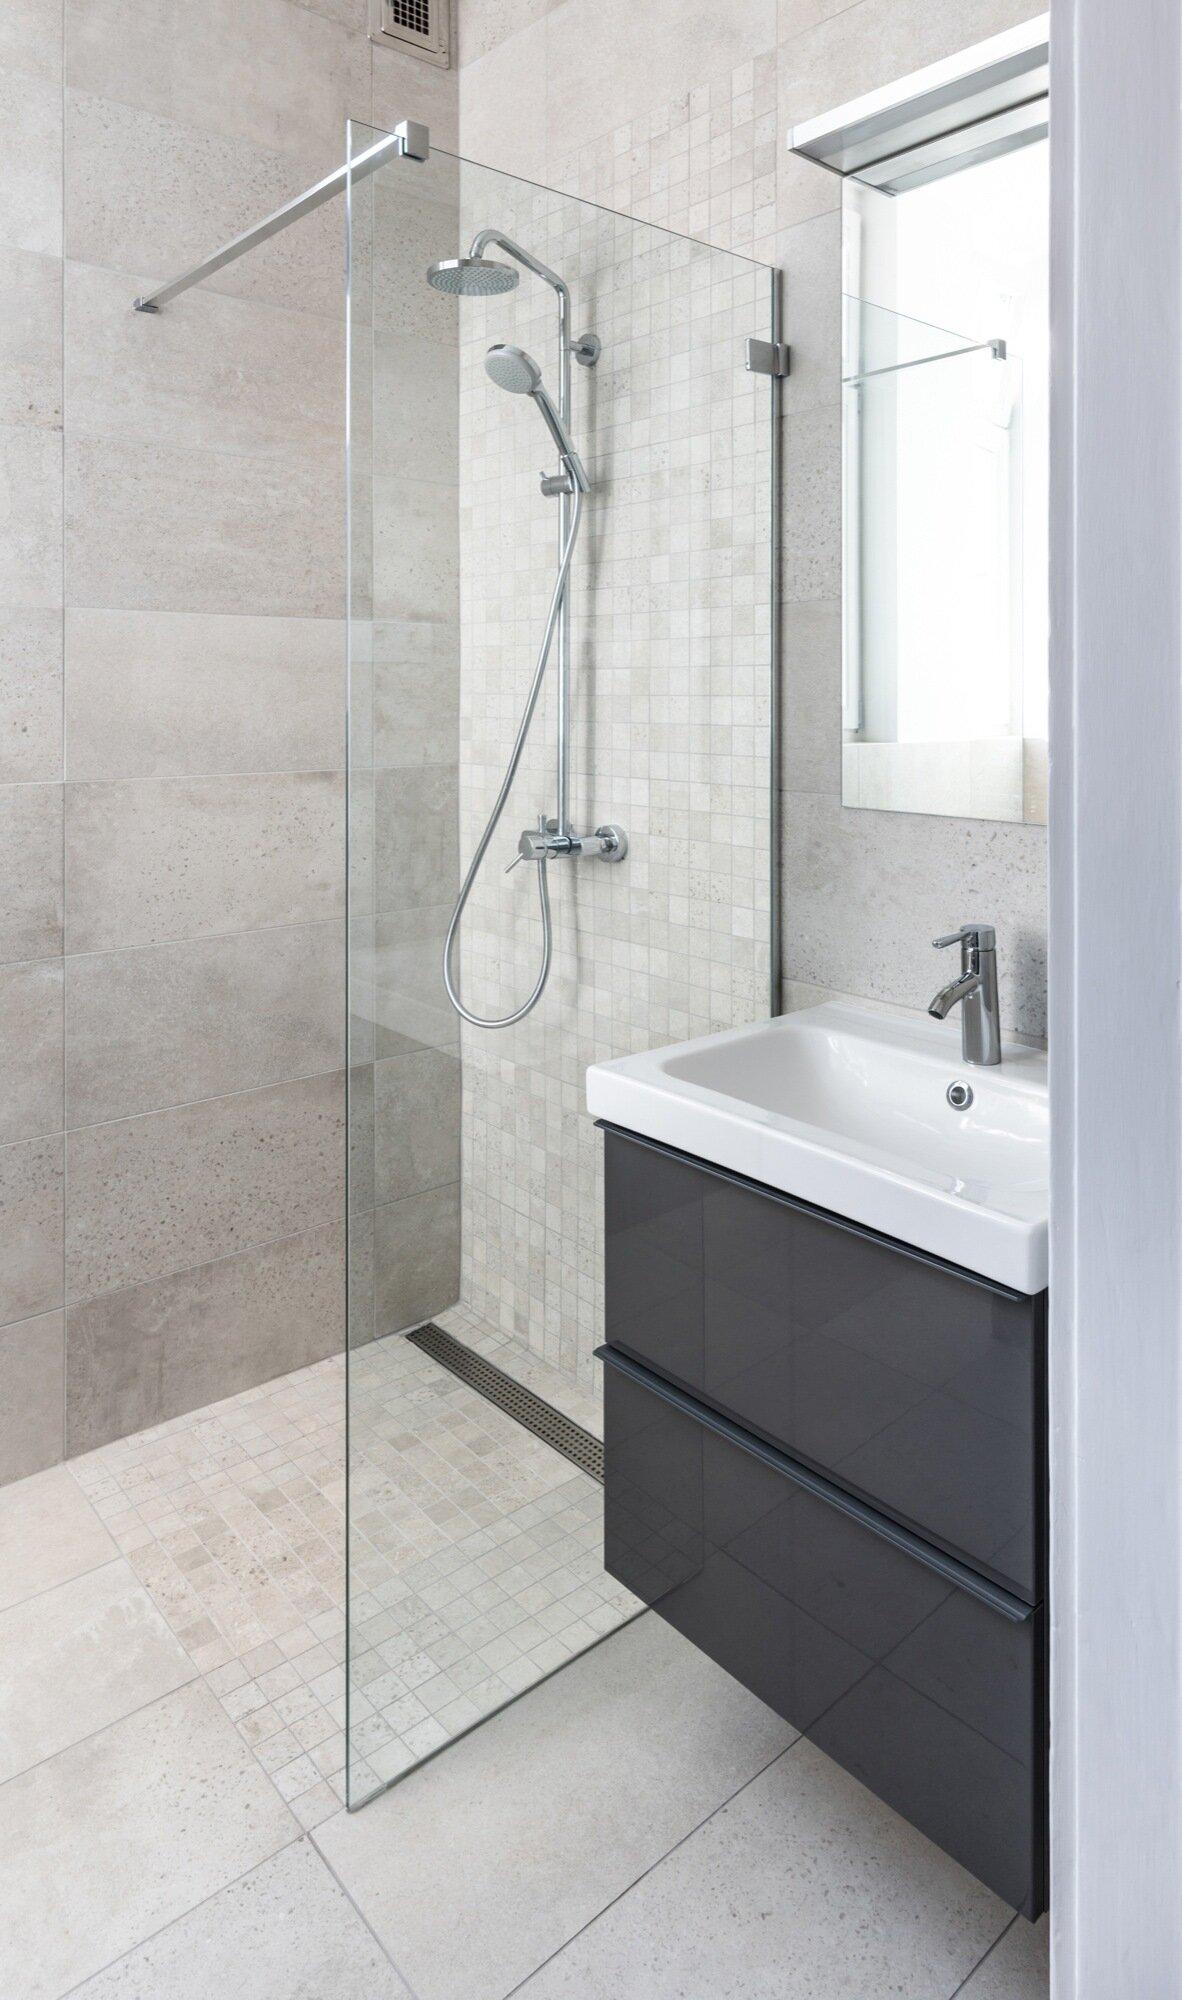 Strict Elegance - Batlab Architects - Hungary - Bathroom - Humble Homes